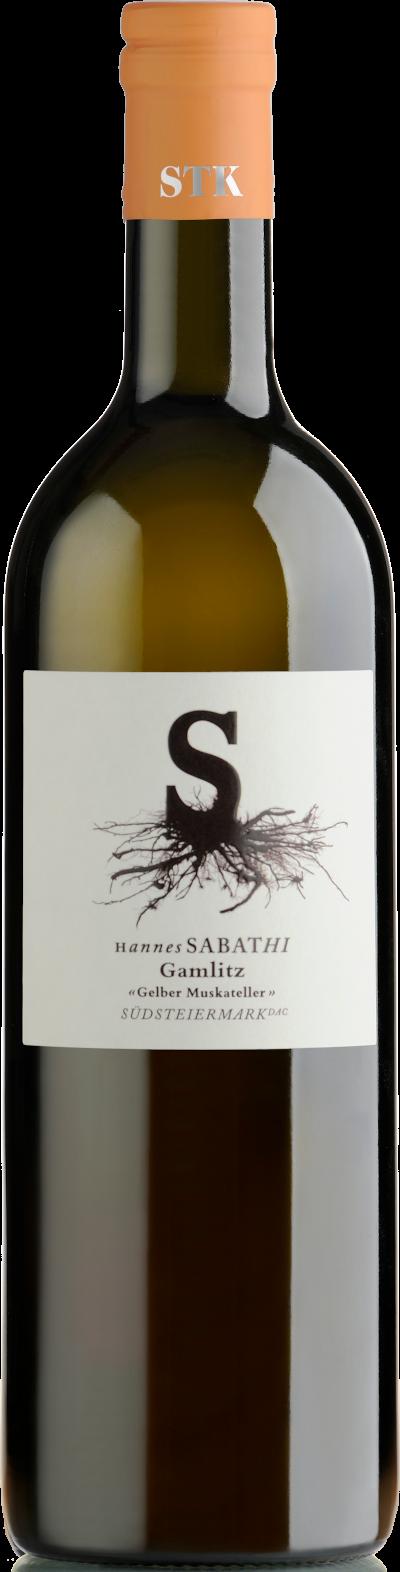 Sabathi Hannes - Gelber Muskateller Gamlitz